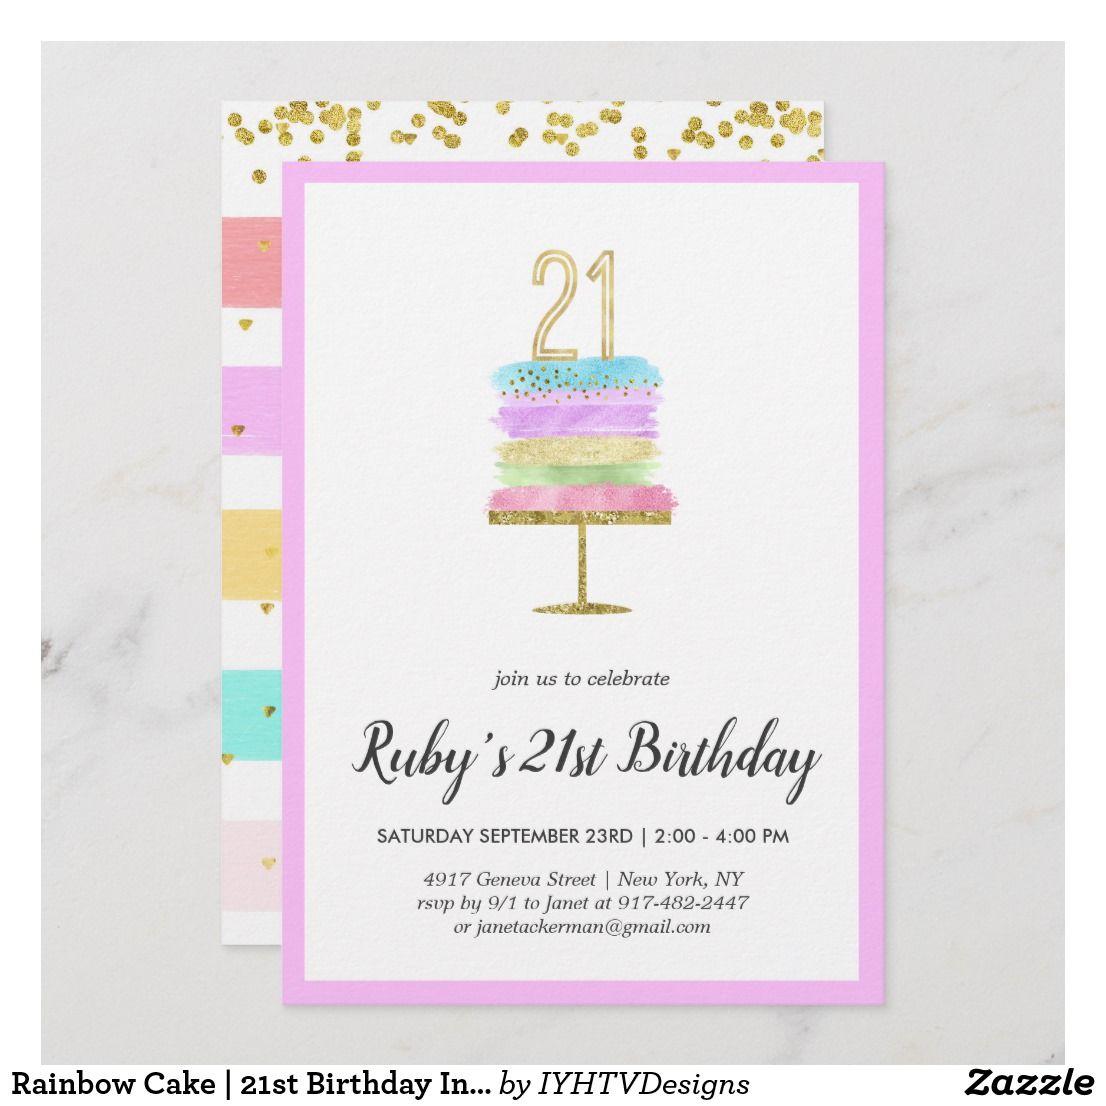 Rainbow Cake 21st Birthday Invitation